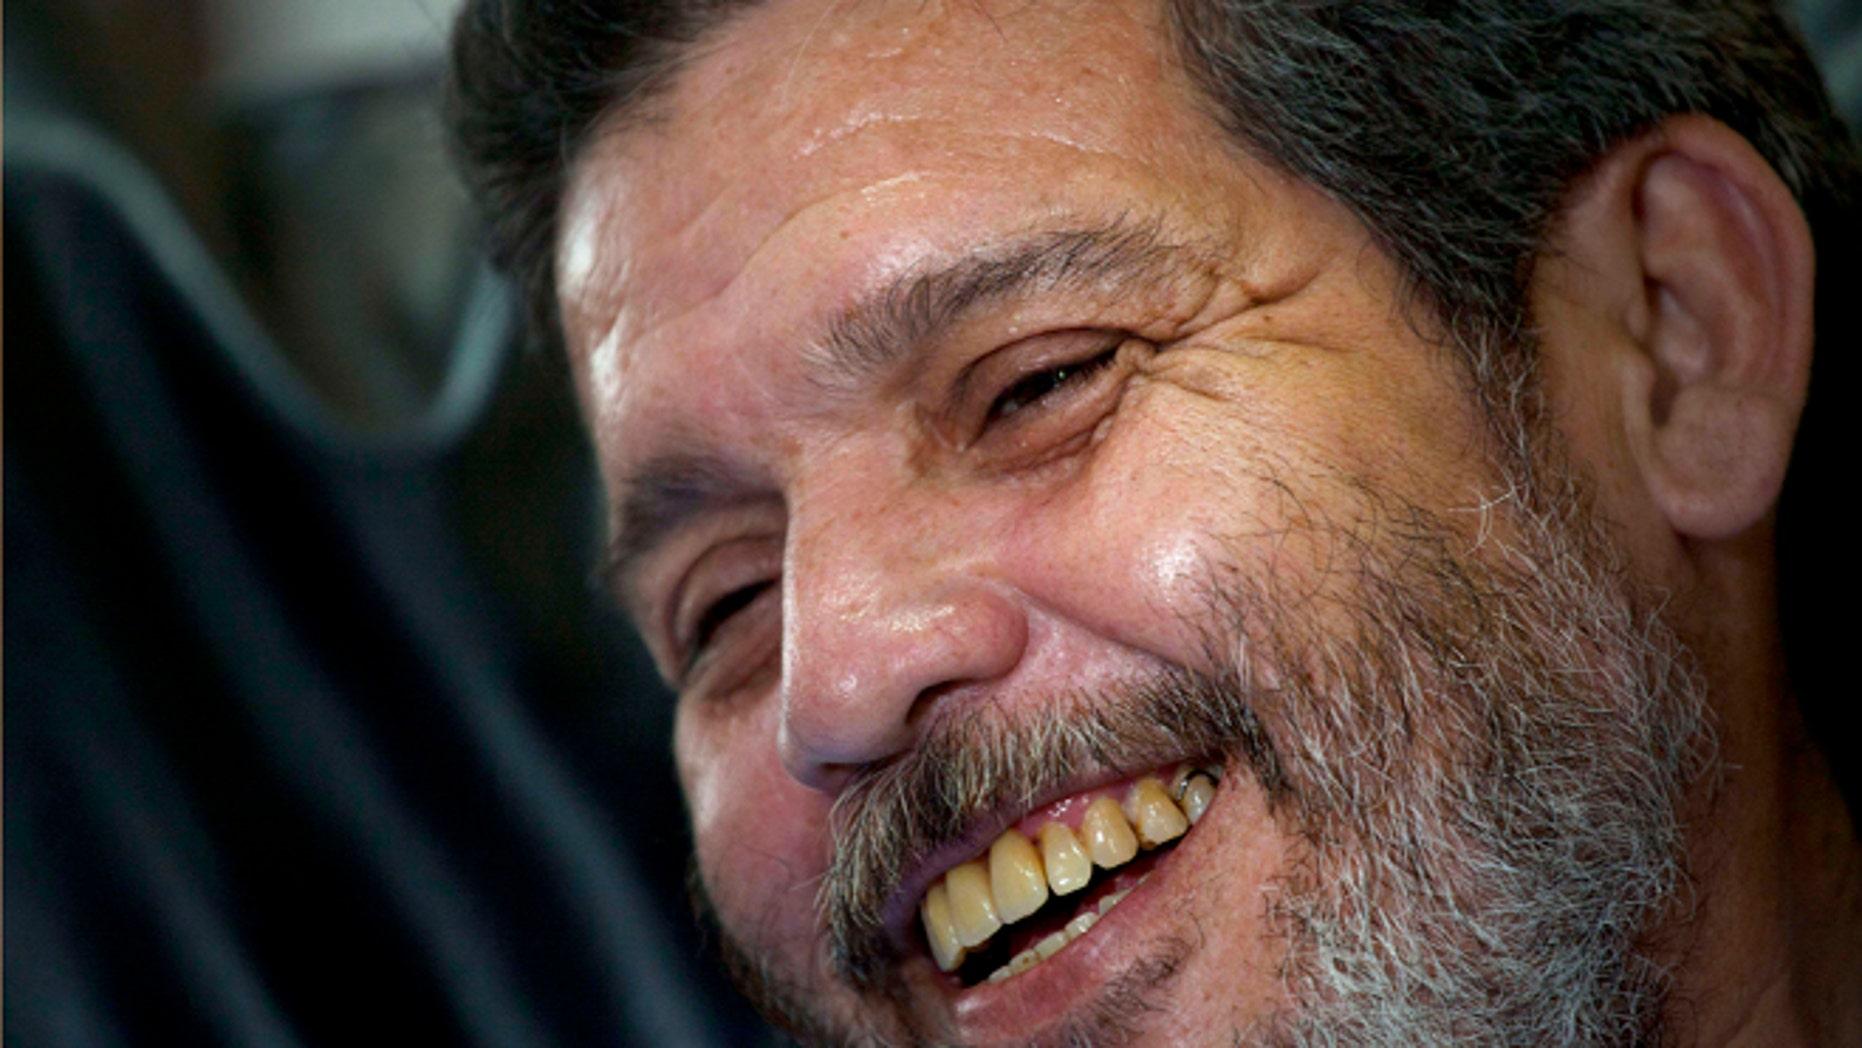 Marco Leon Calarca, spokesman and member of FARC smiles during an interview in Havana, Cuba, Friday, Sept 7, 2012. (AP Photo/Ramon Espinosa)